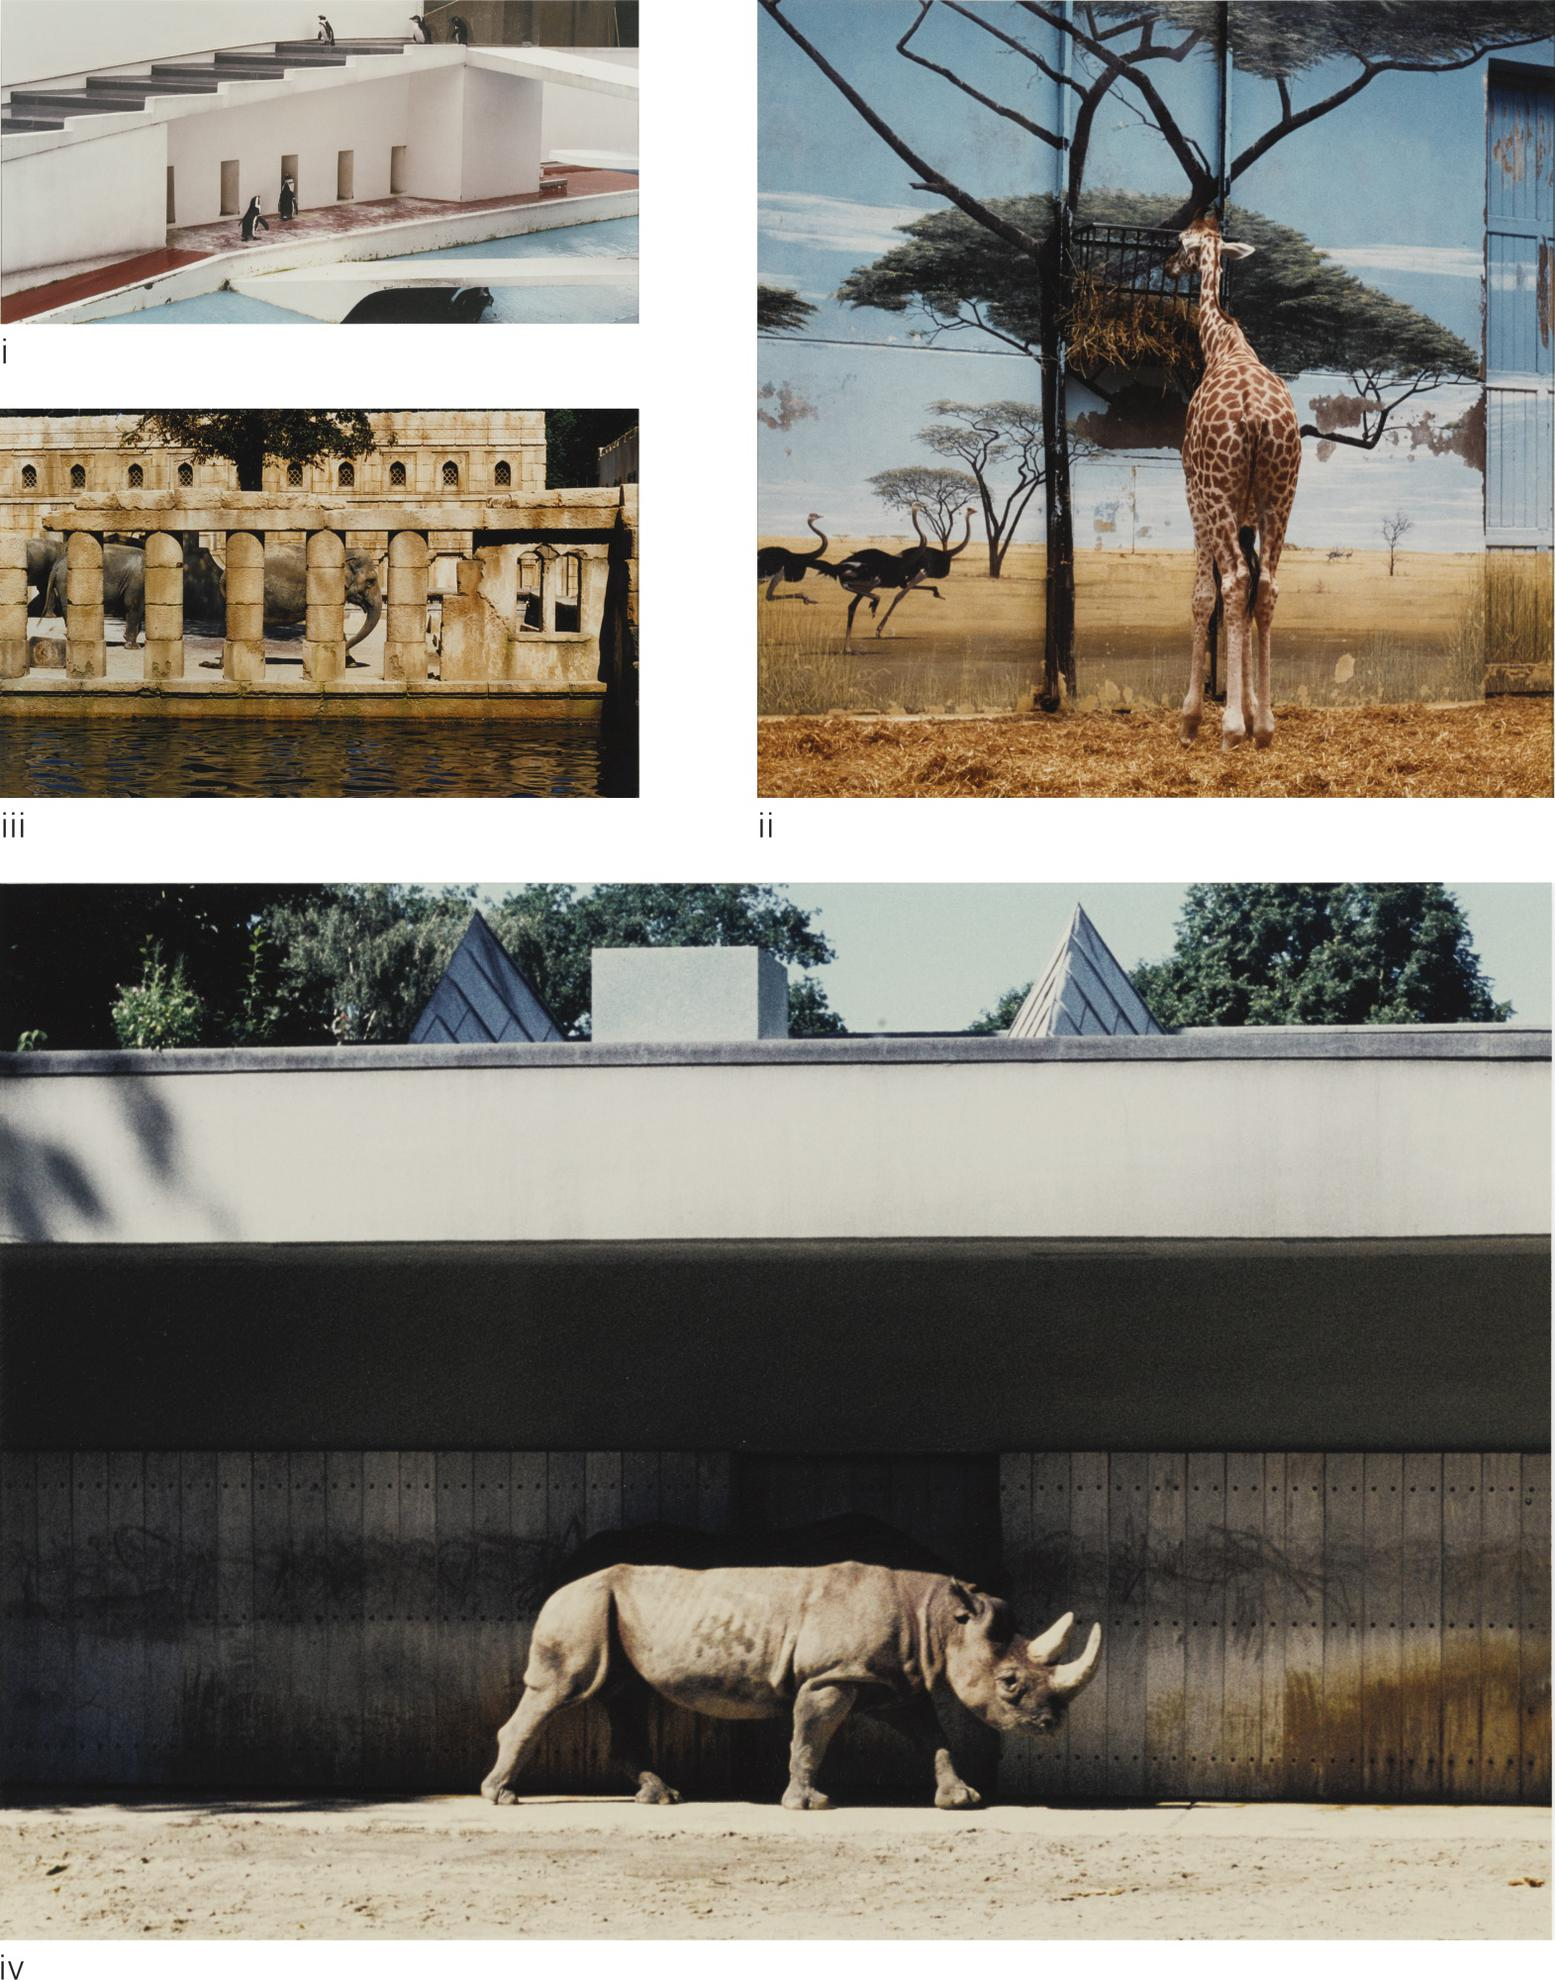 Candida Hofer-(i) Zoologischer Garten London V (ii) Zoologischer Garten Paris I; (iii) Zoologischer Garten Hanover III (iv) Zoologischer Garten Hanover IV-1997